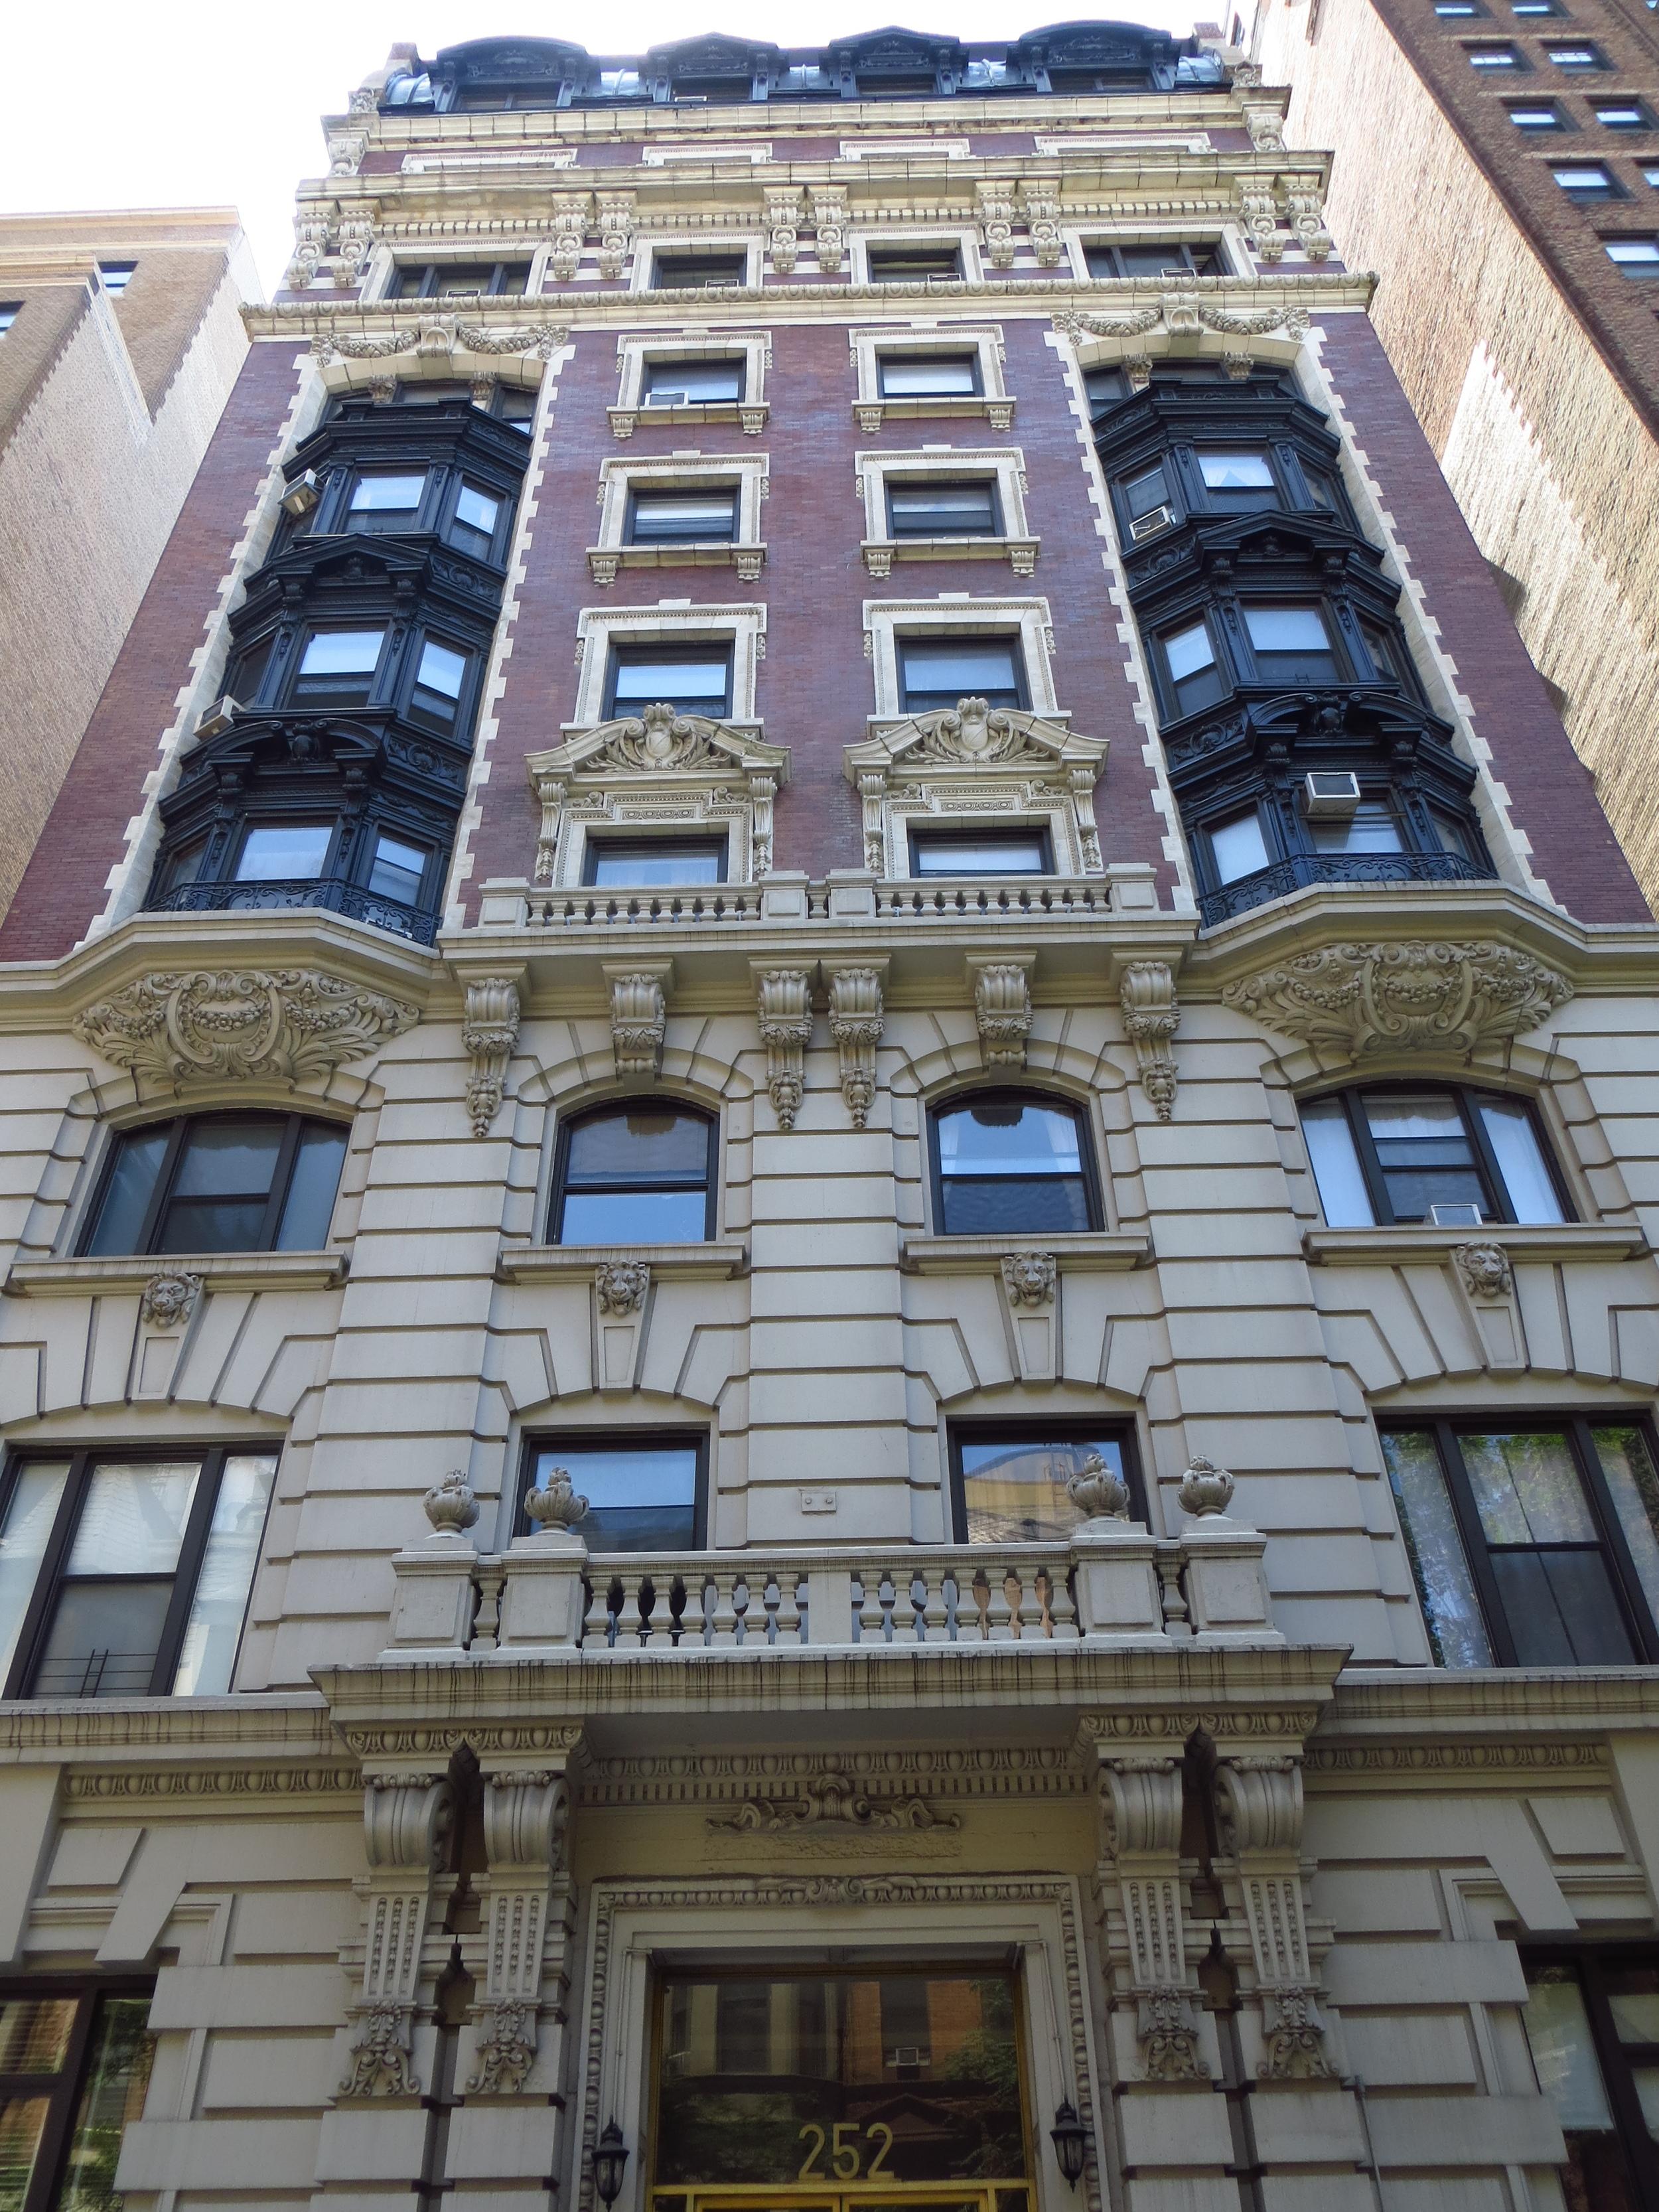 [Uncreative adjective] apartment building